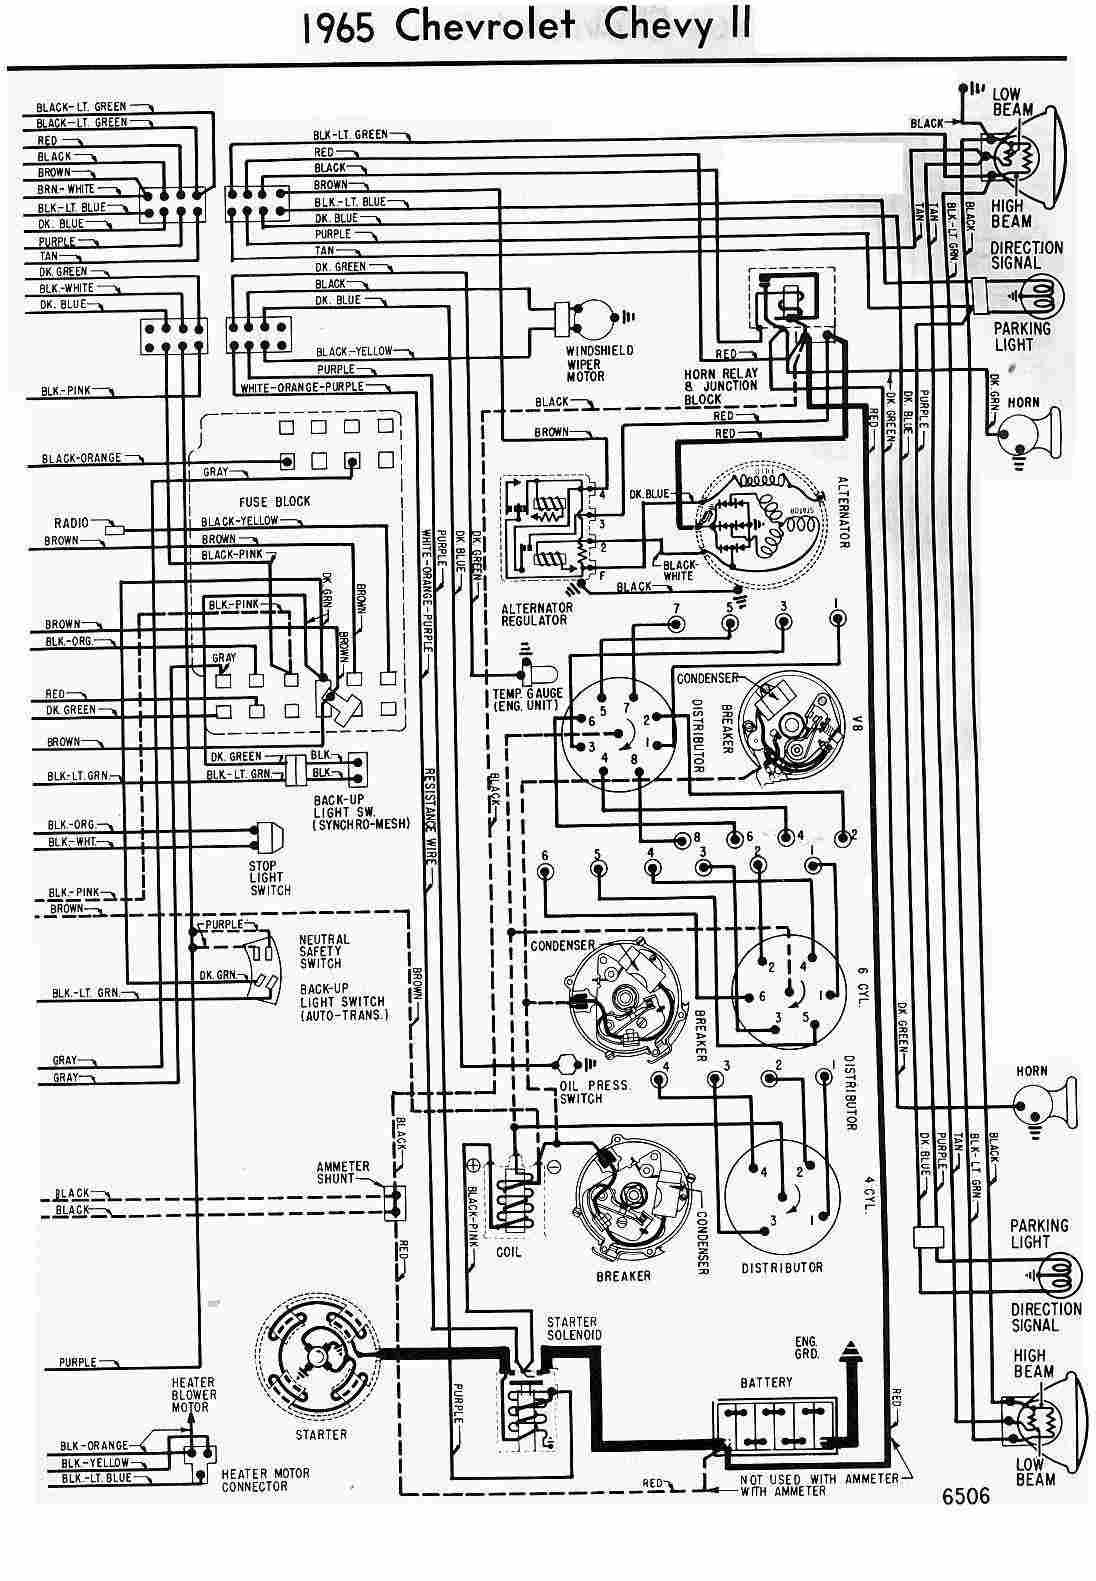 medium resolution of 66 impala ss wiring diagram wiring diagrams66 impala ss wiring diagram wiring library 1964 impala tail